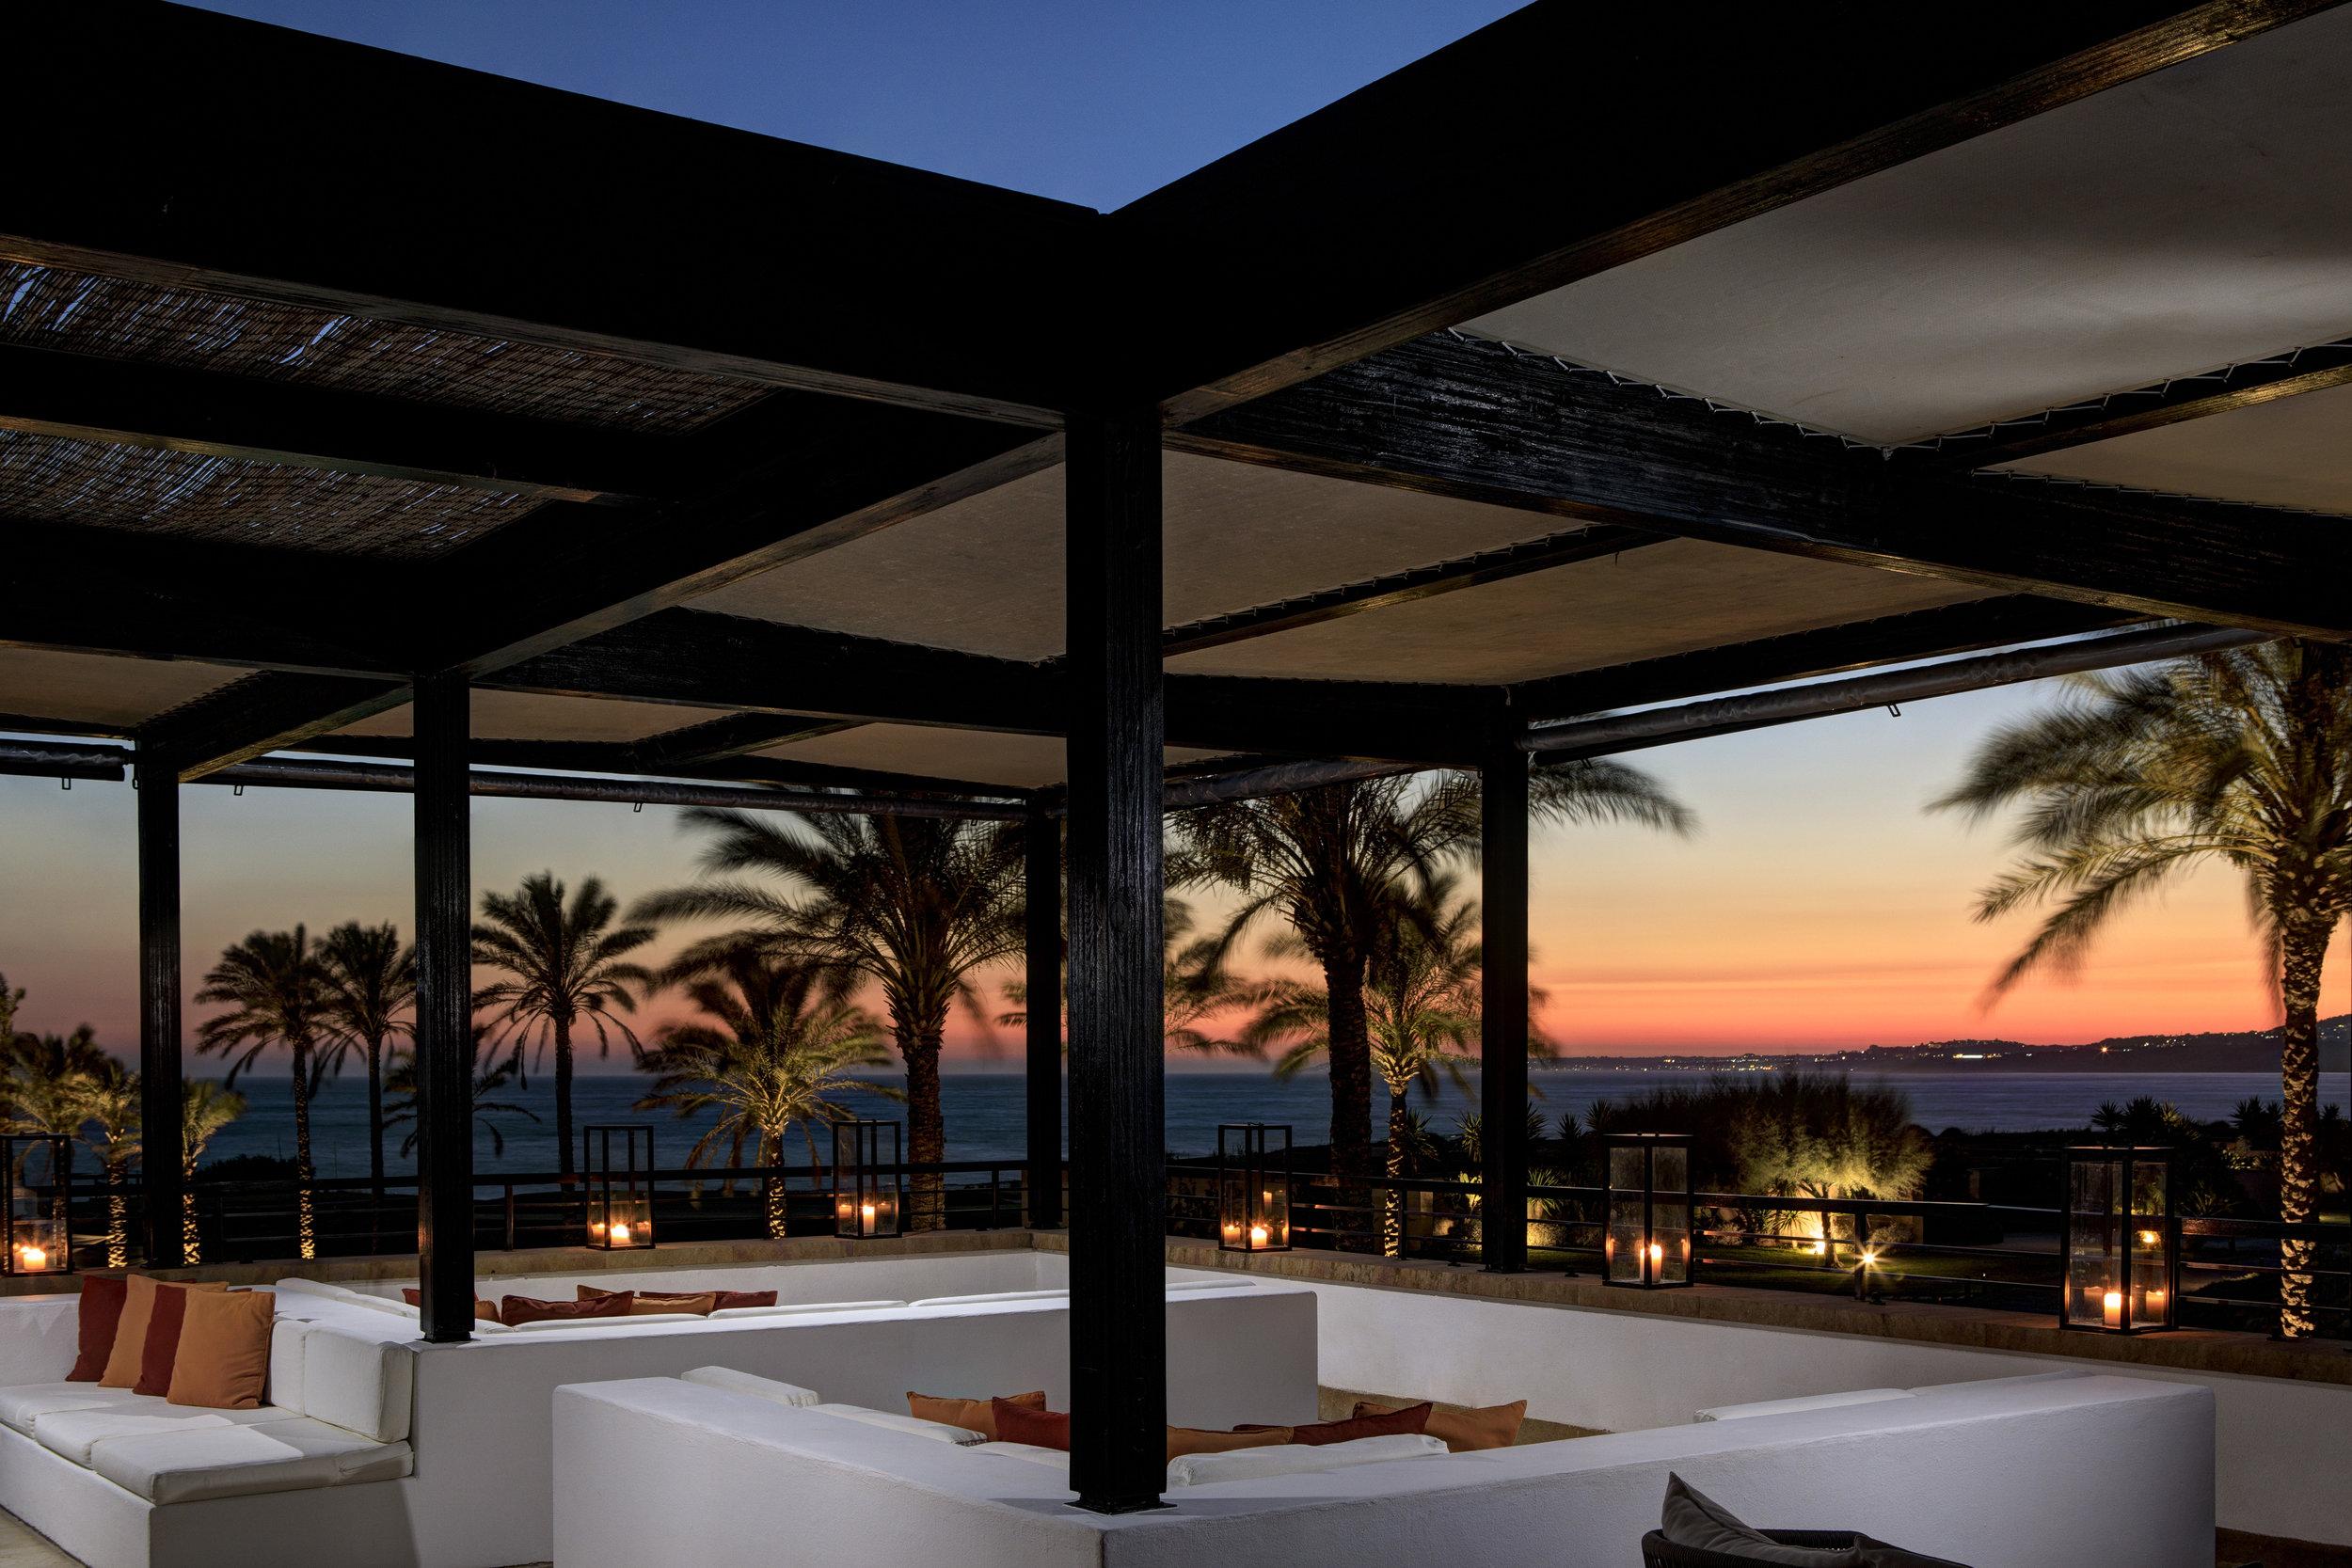 9 RFH Verdura Resort - Granita Bar Terrace 4904 Jul 17.JPG